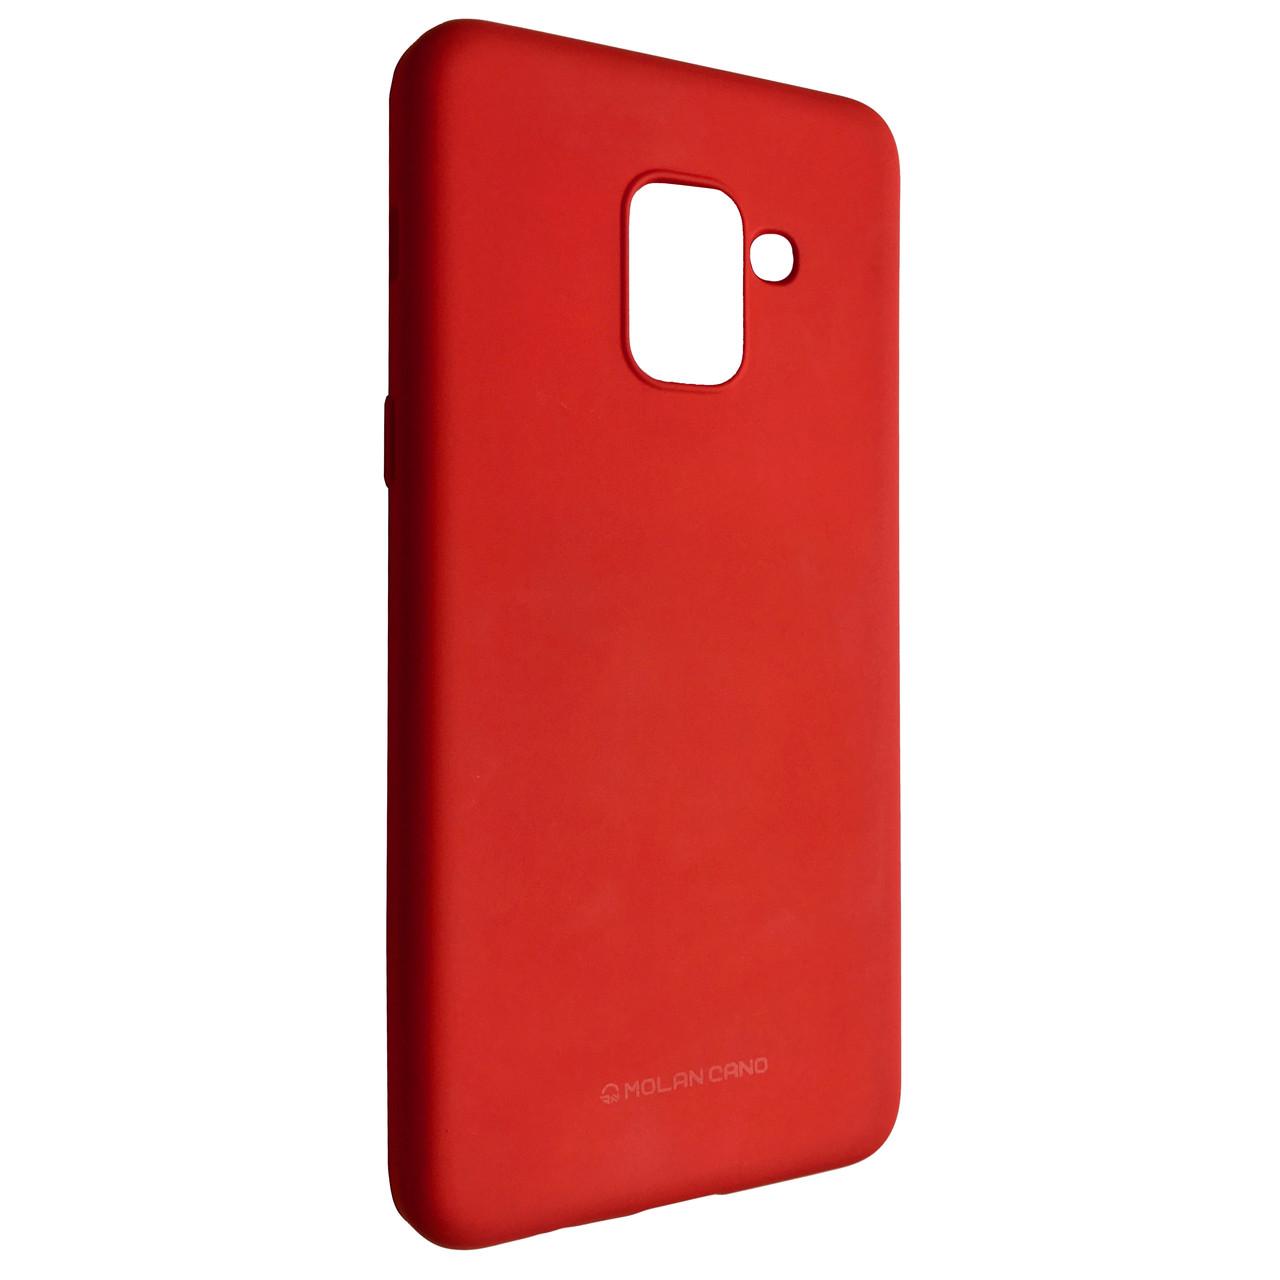 Чехол Hana Molan Cano Samsung A6 (2018) (red)